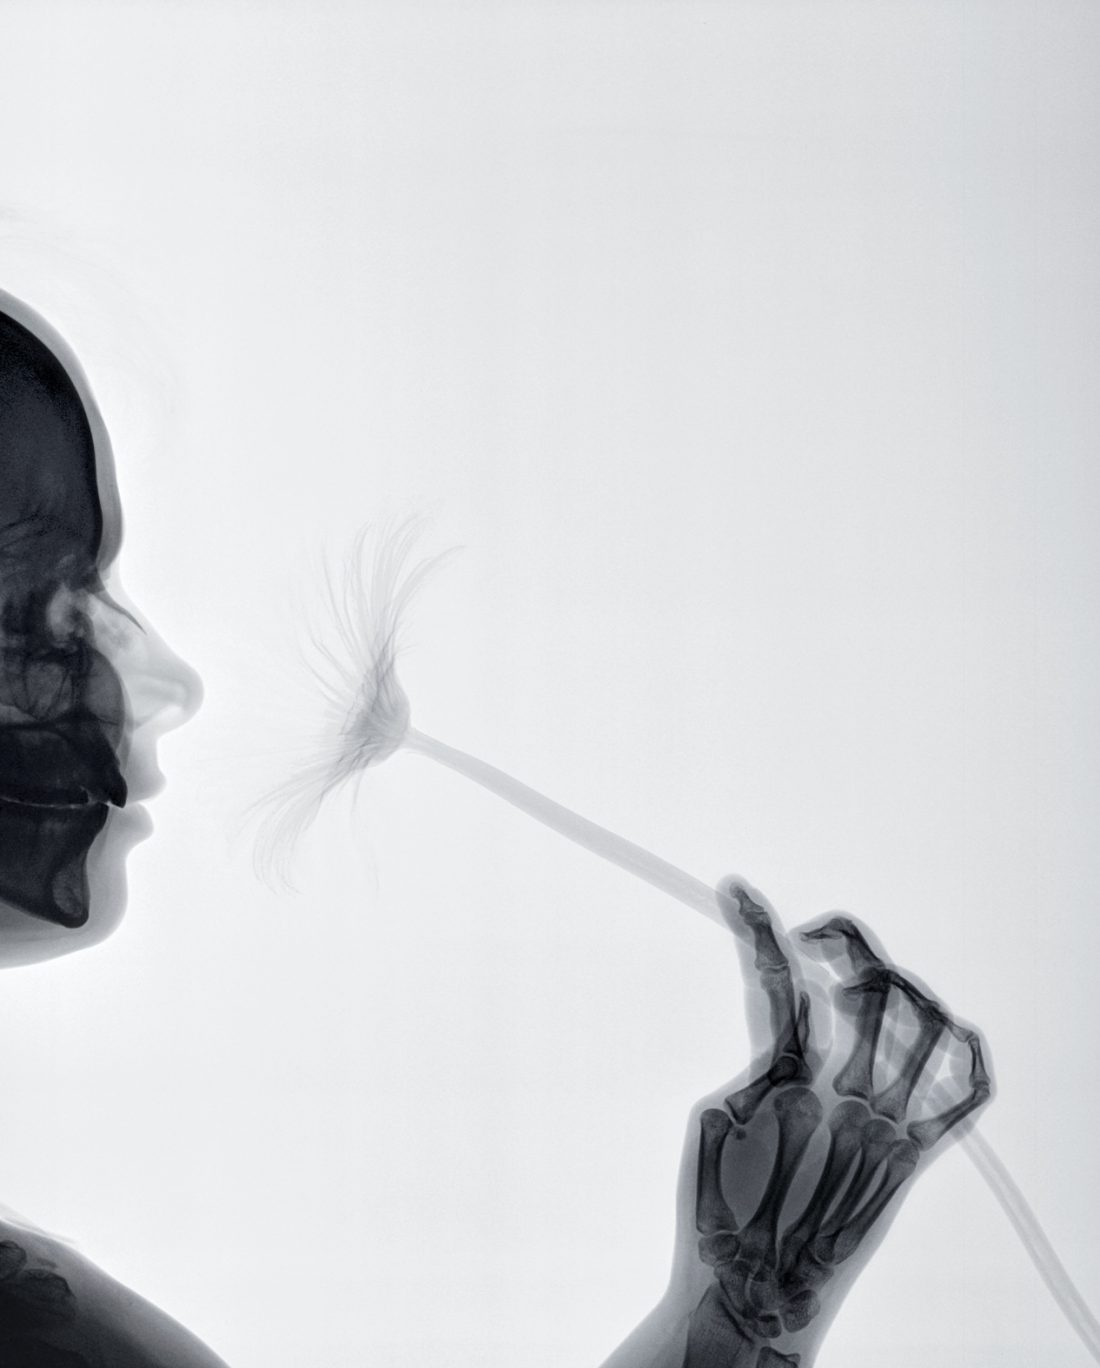 Grotesque & Arabesque (Profile with Gerbera II), x-ray, light box, 42,5 x 52,5 cm